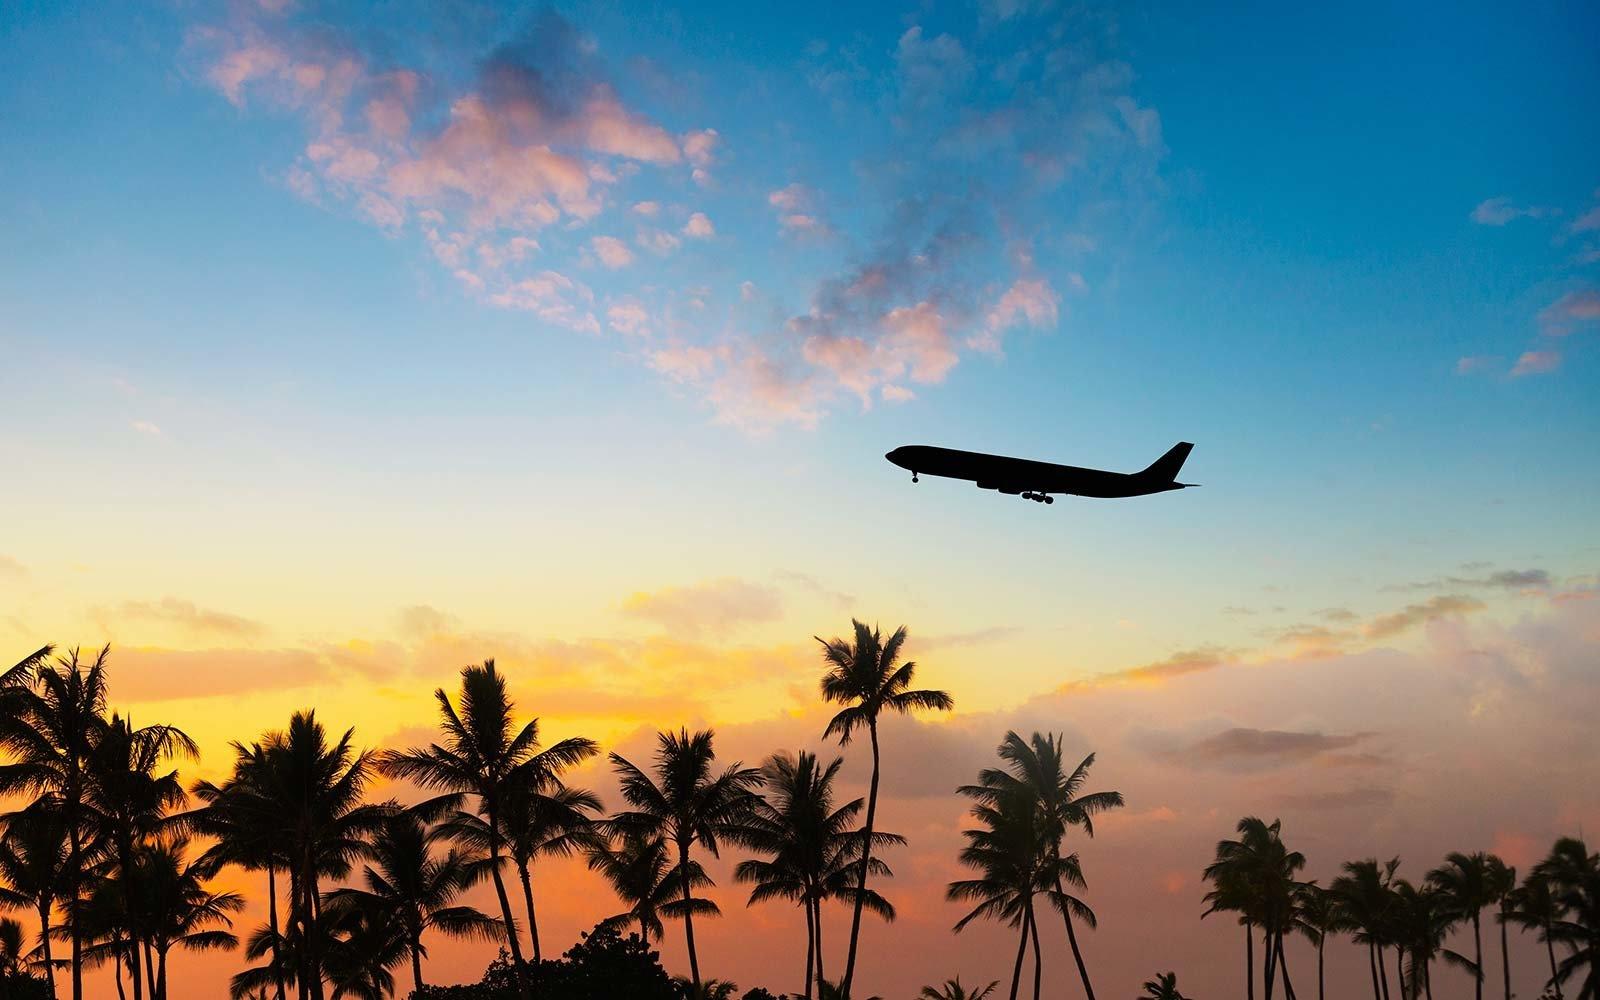 airplane-sunset-flight-HAPPYPASSENGER1017